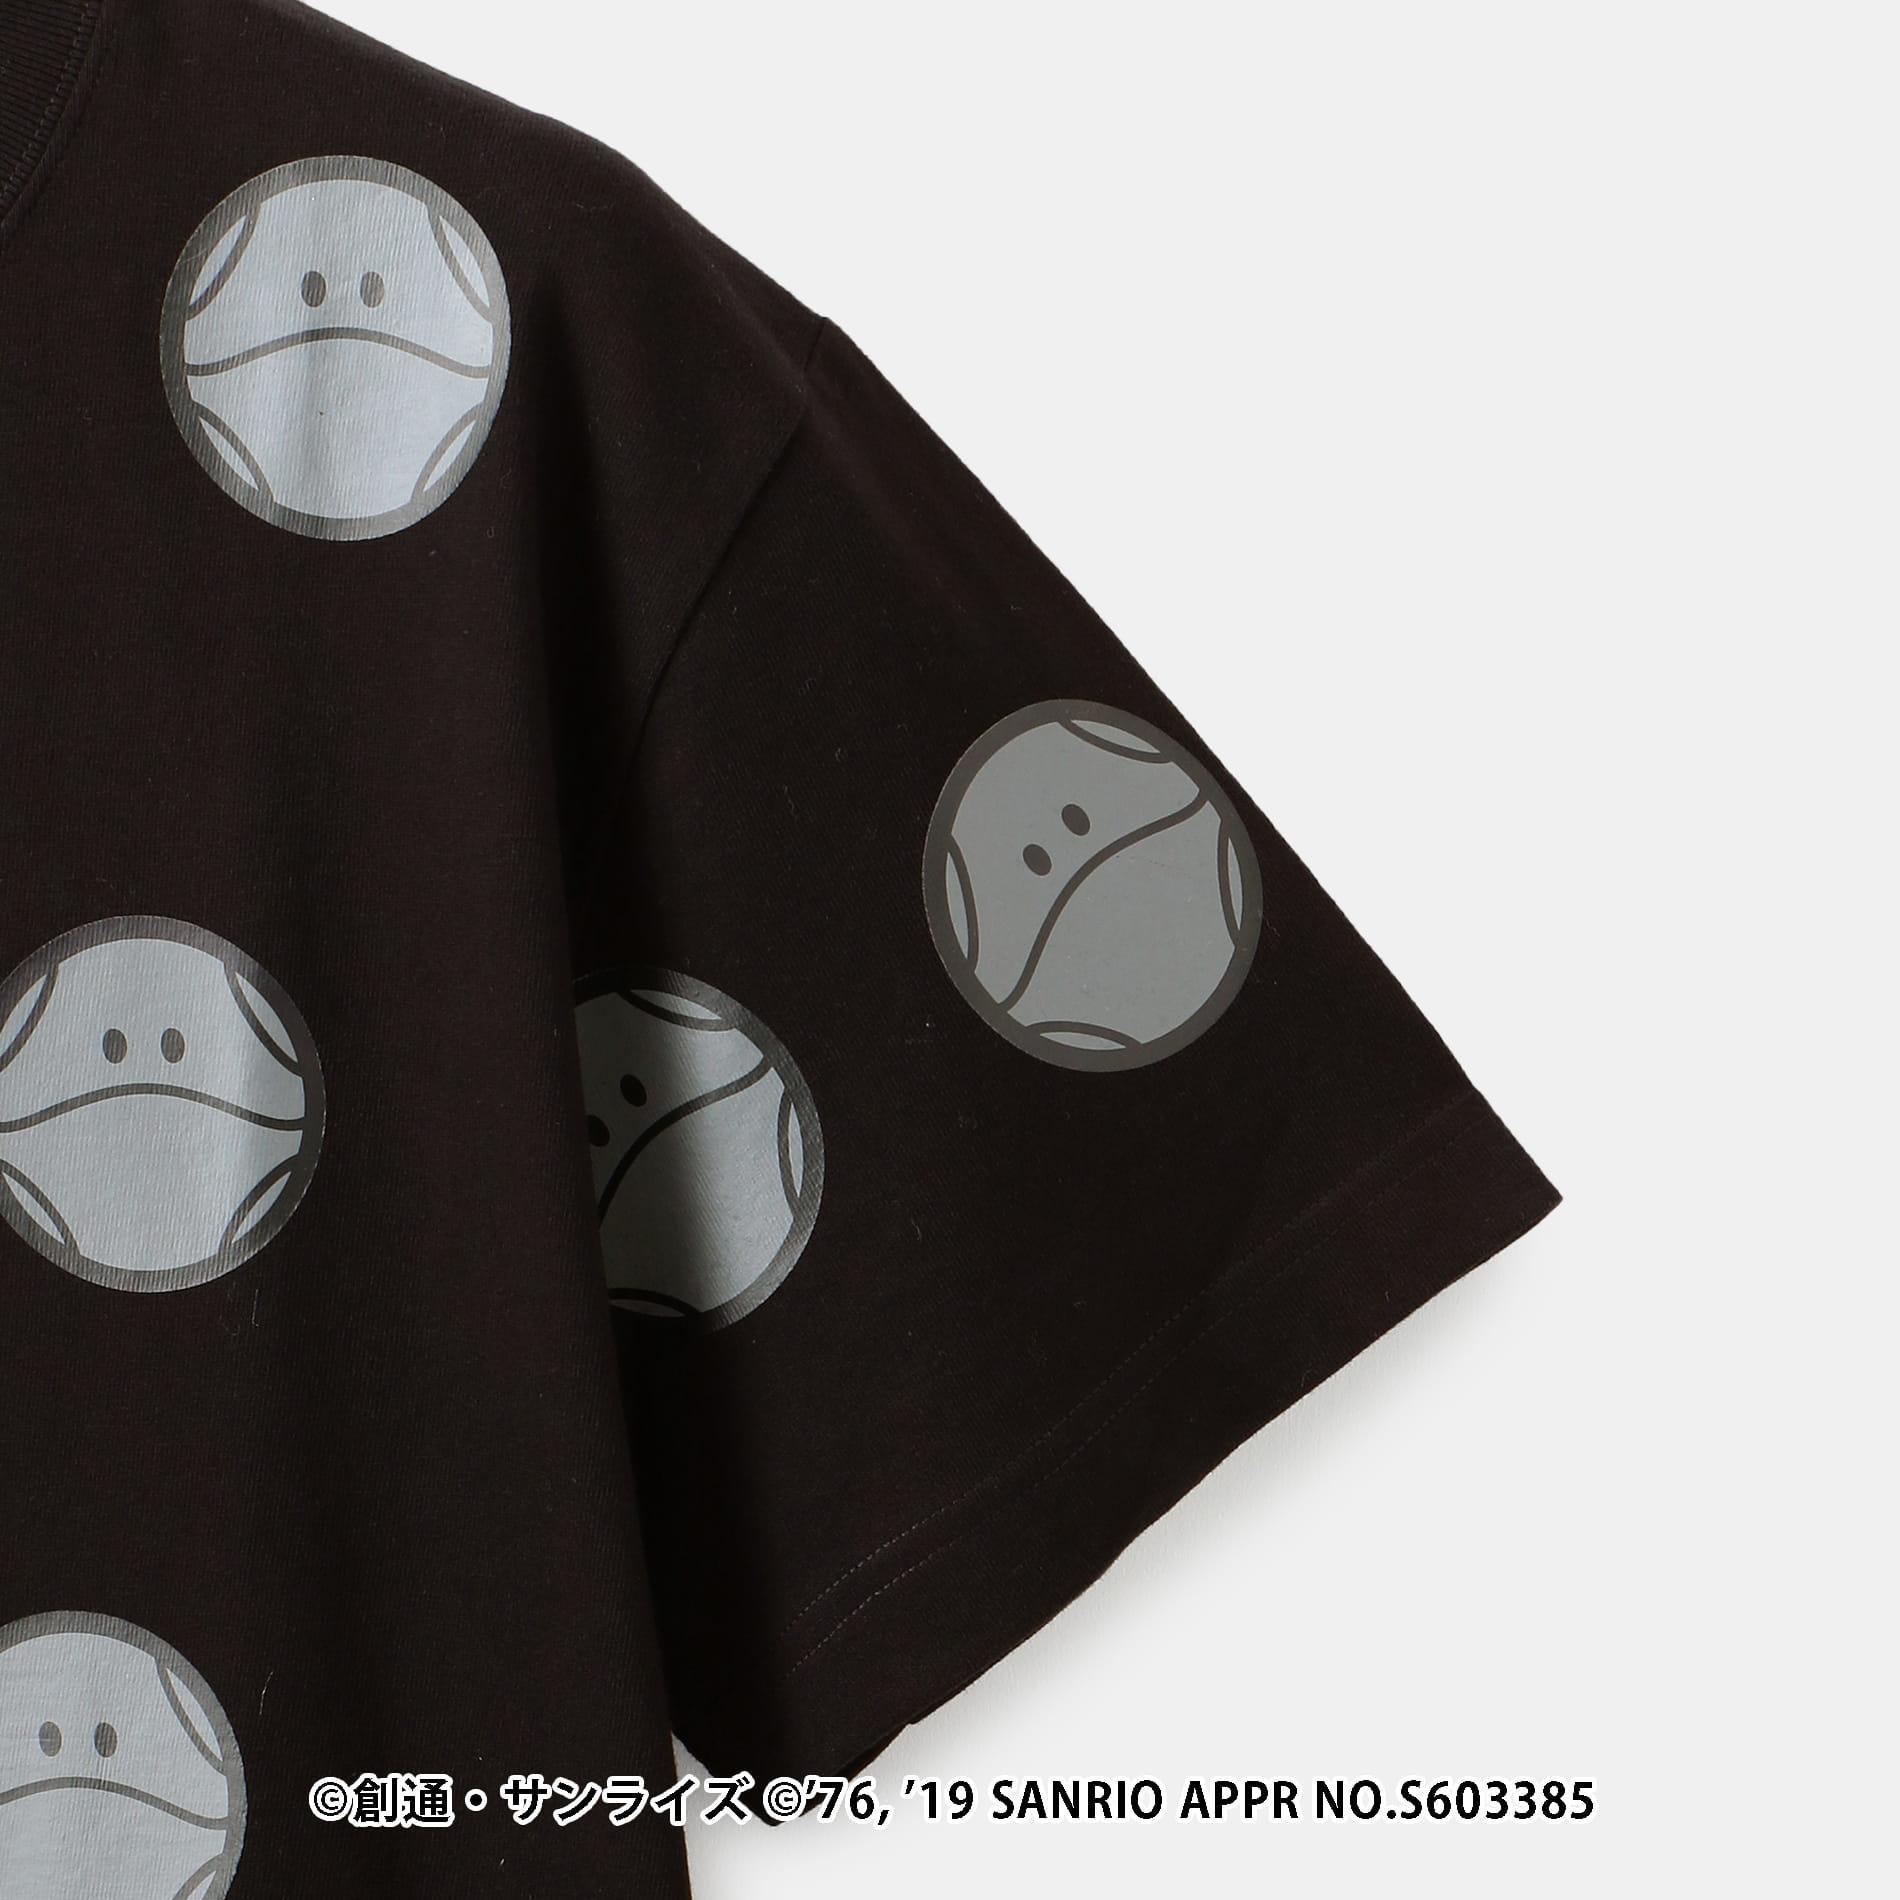 【LOVELESS×機動戦士ガンダム】ハロ コラボTシャツ